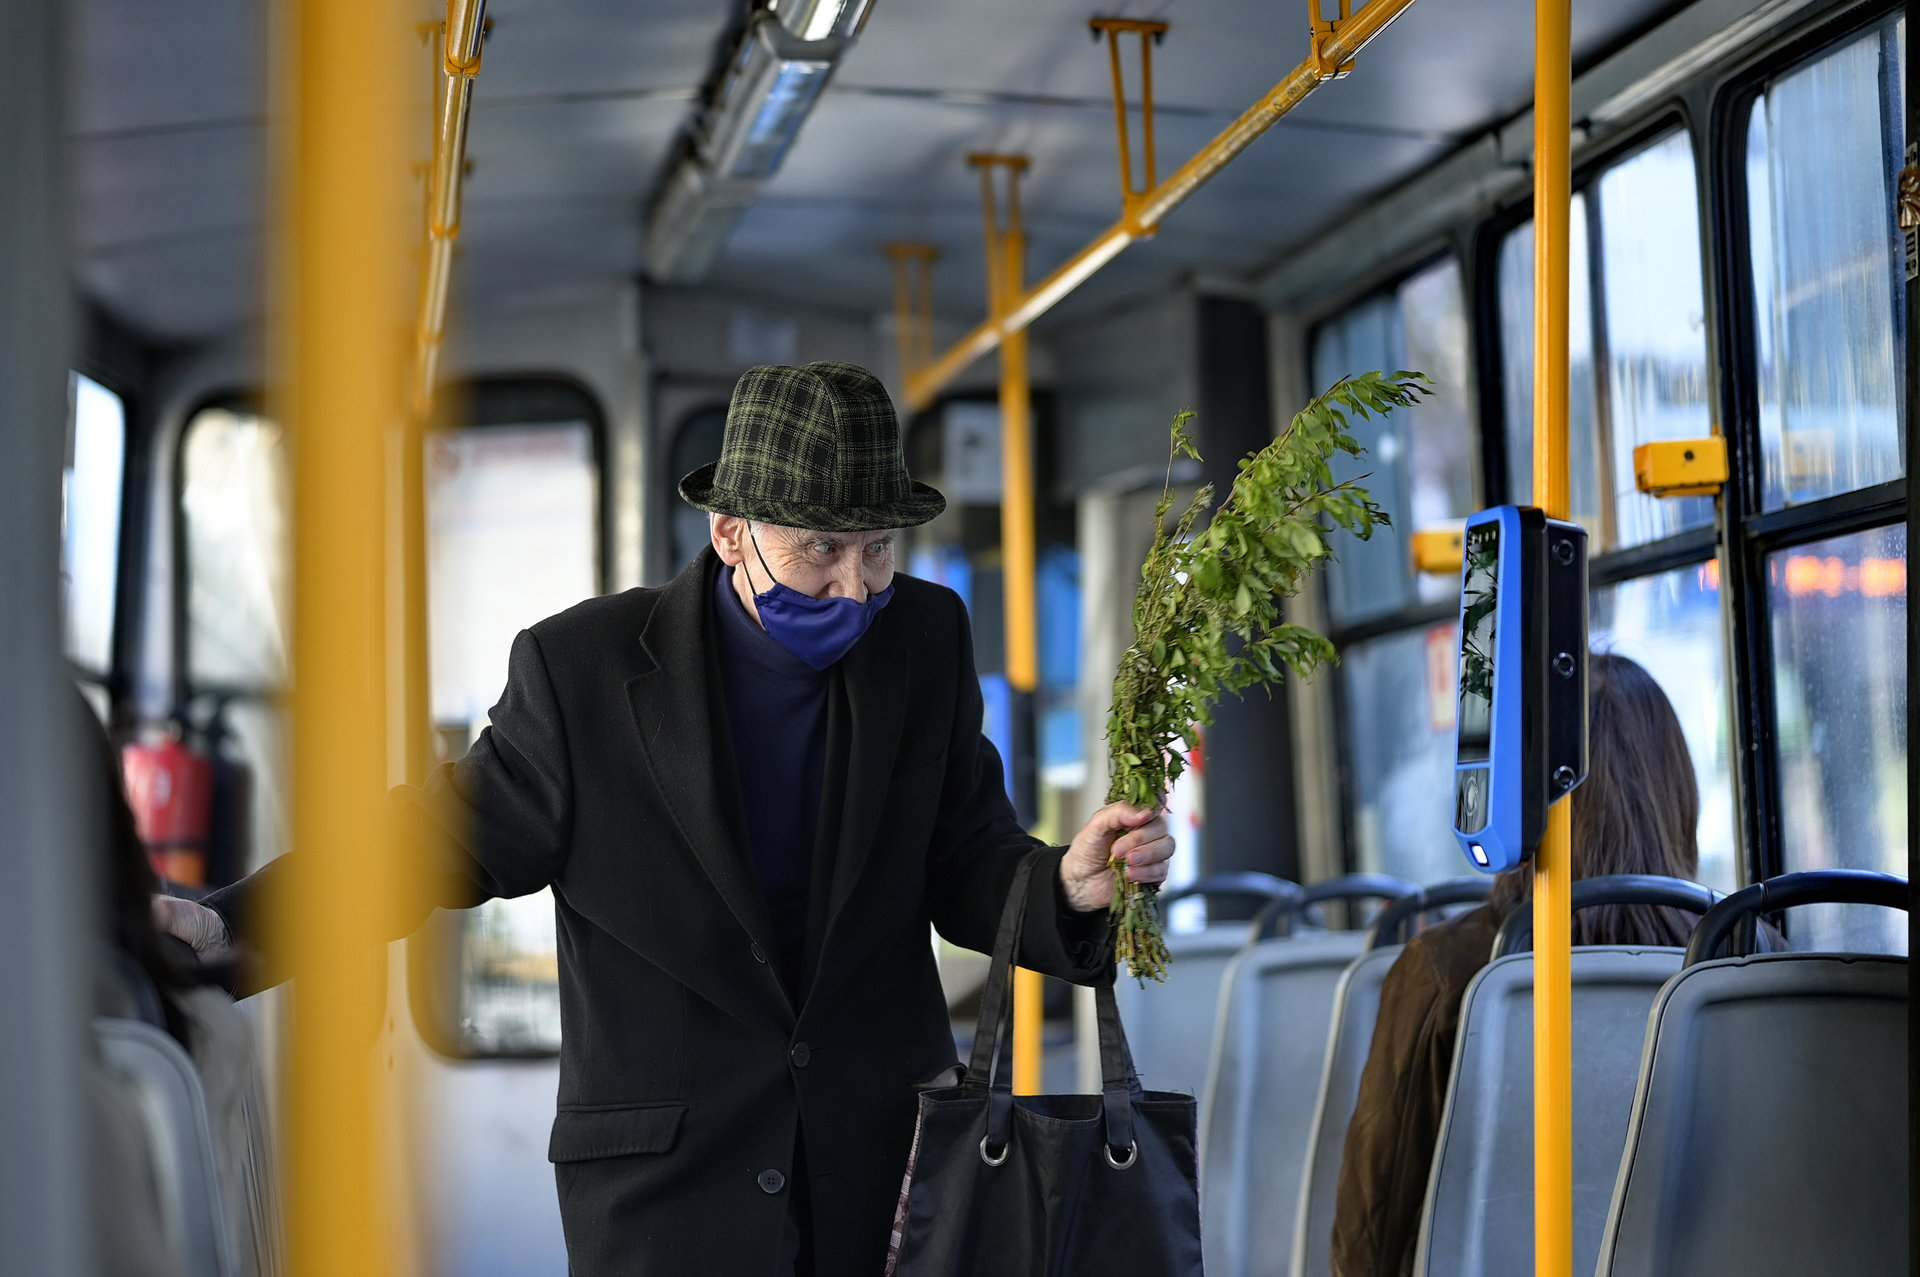 Photo in Daily round | Author Antonio Georgiev - toni.ai | PHOTO FORUM